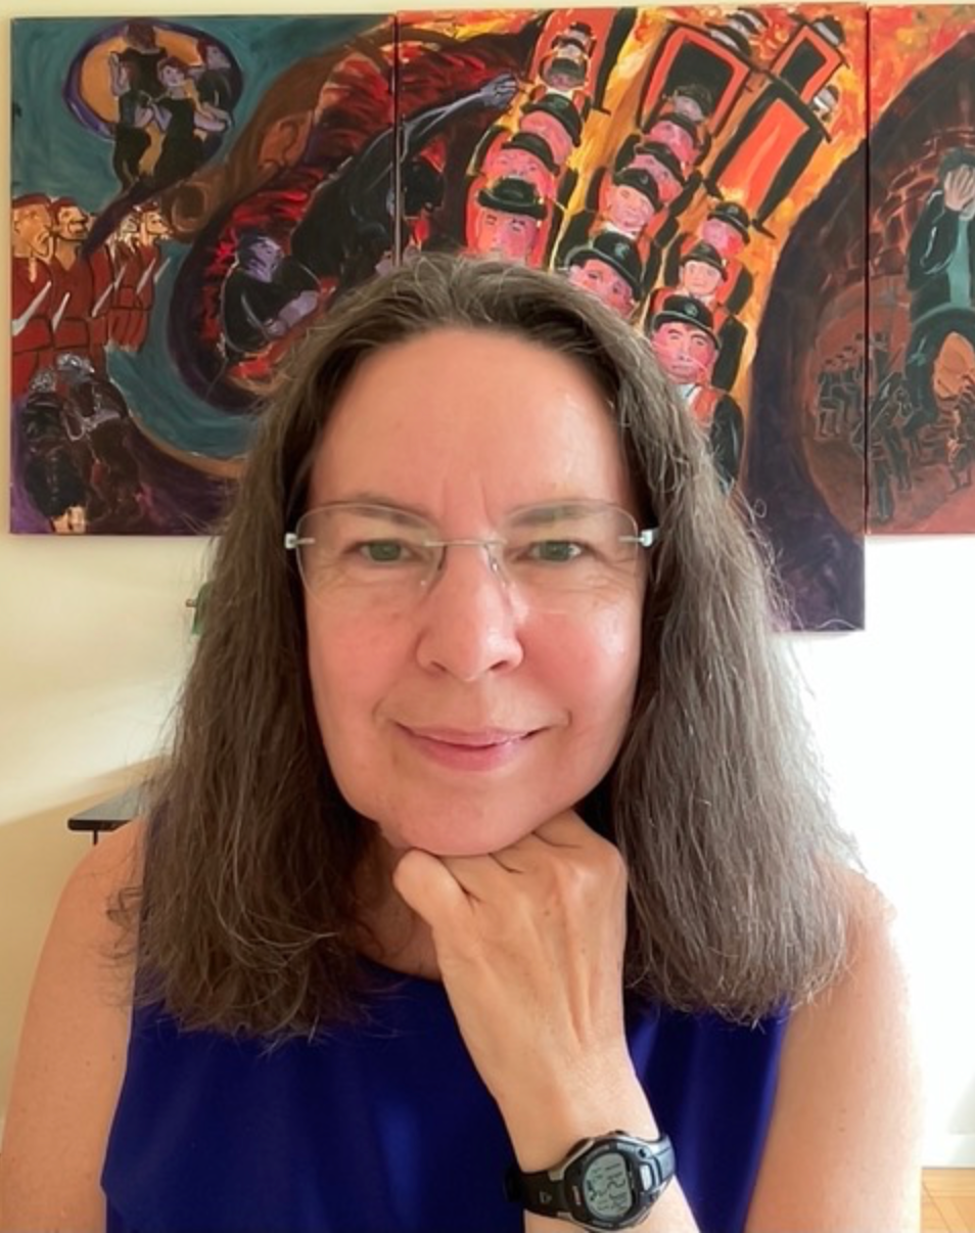 Jessie Siegel, The Insider columnist who writes Washington Whispers